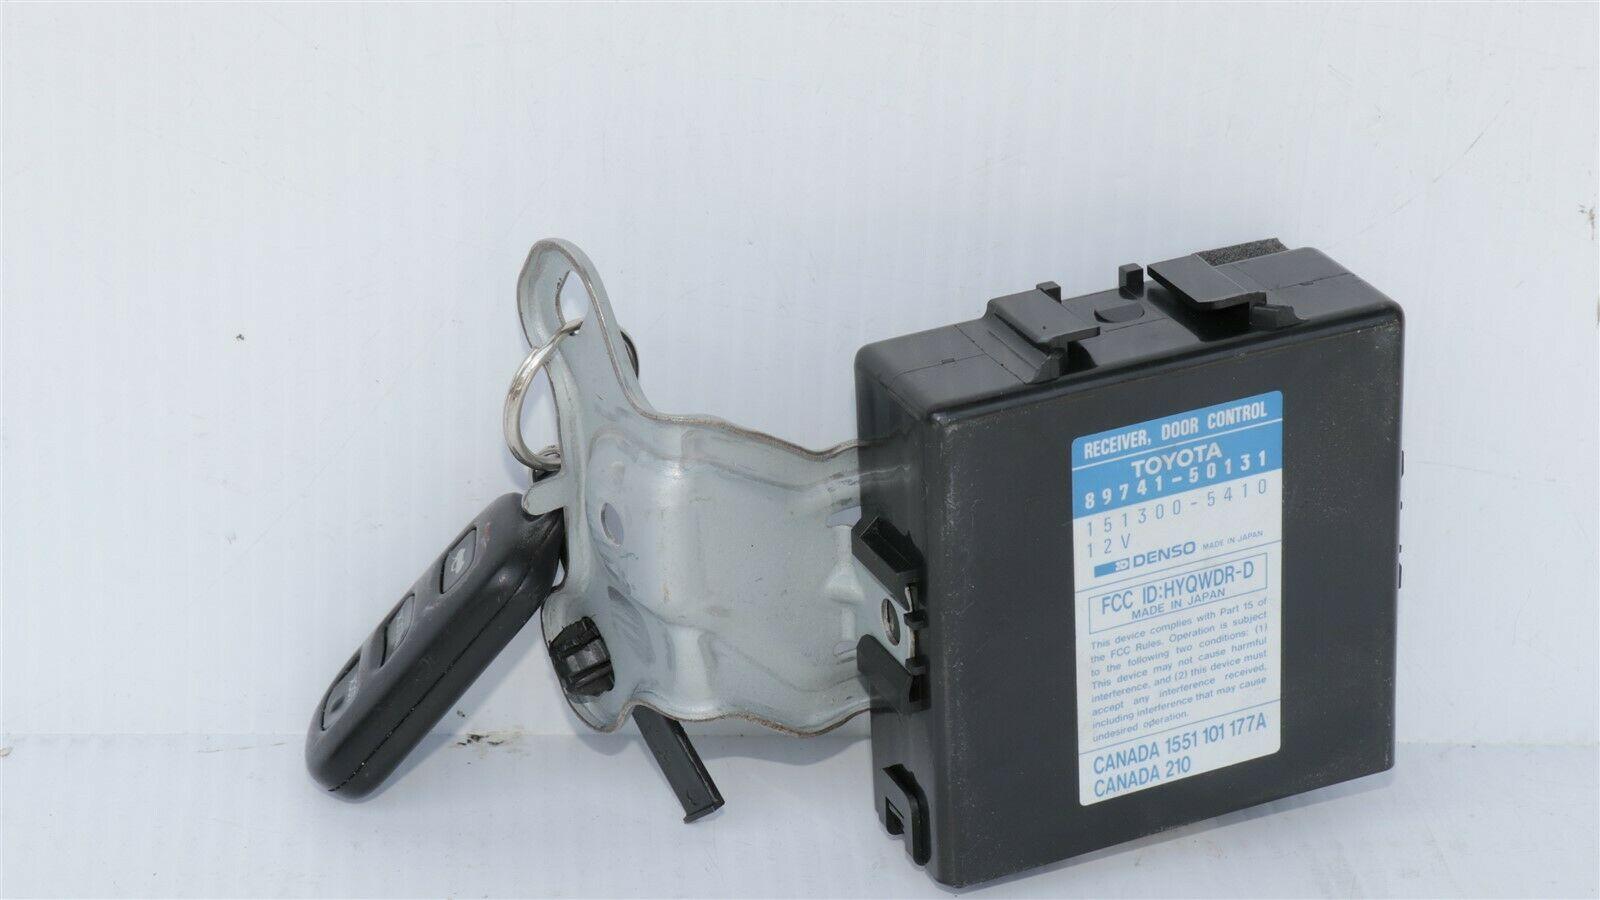 95-97 LS400 DCR Keyless Entry Door Control Receiver Module & Fob 89741-50131